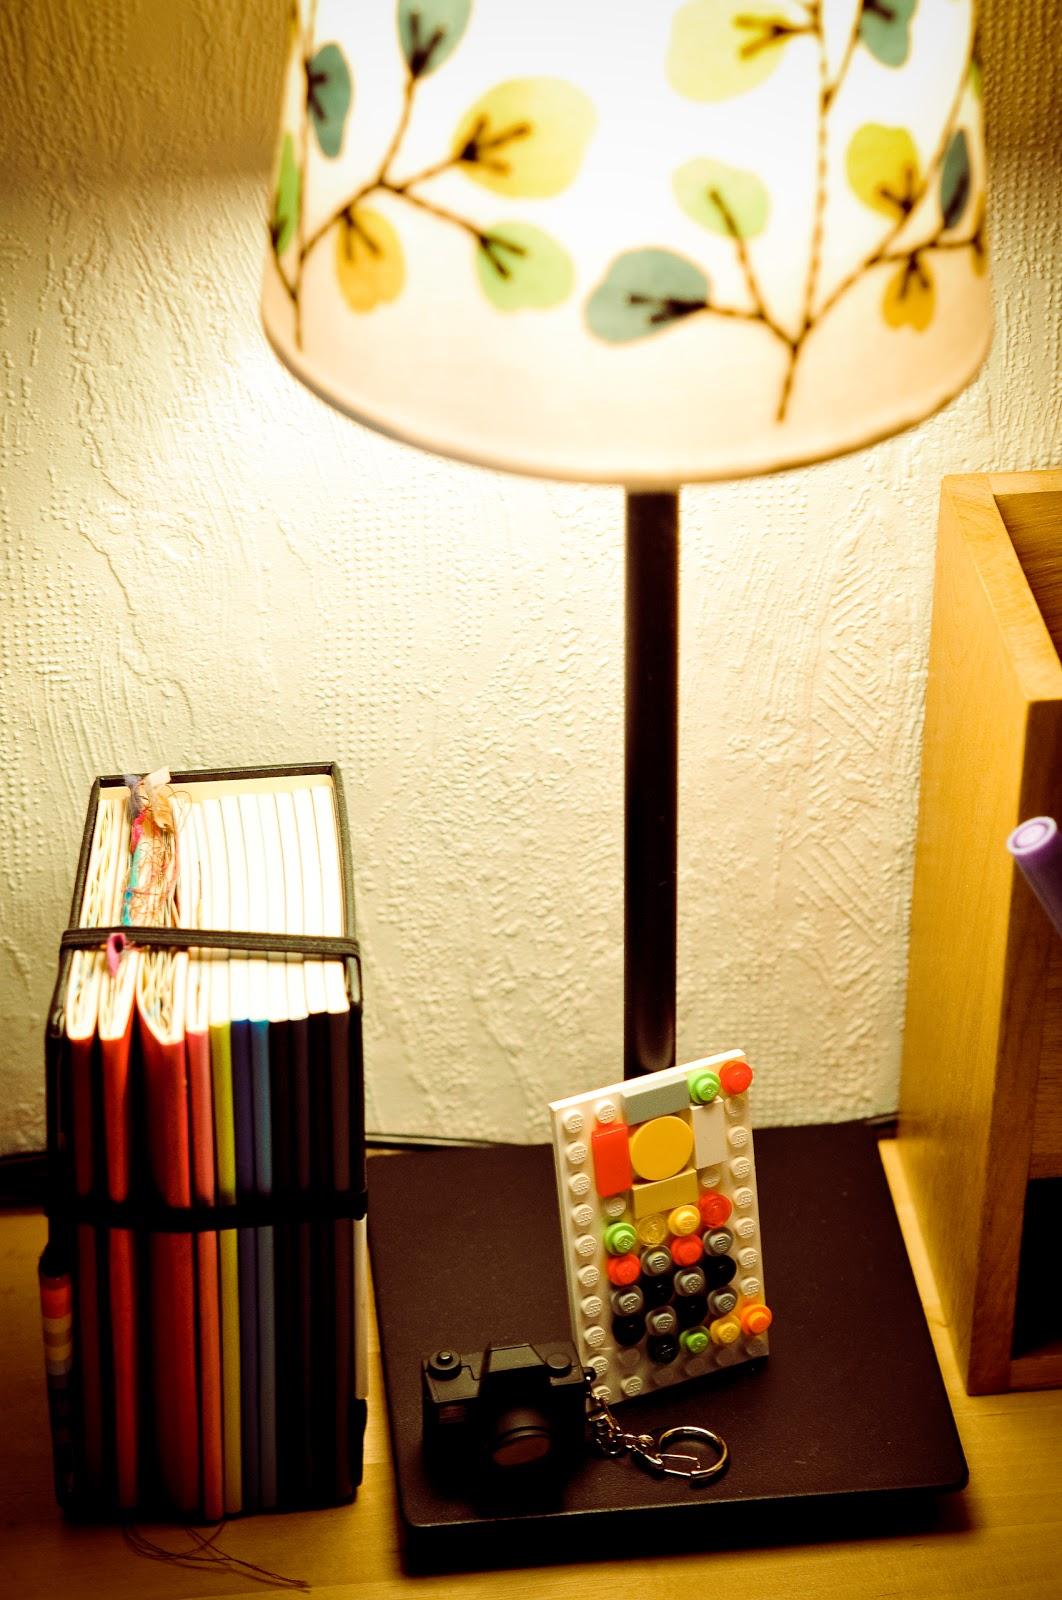 http://1.bp.blogspot.com/_OCyuVnCVWW4/S-0EeP9O8YI/AAAAAAAALuY/i0MAm7KbGuM/s1600/LR+desk+scene.jpg